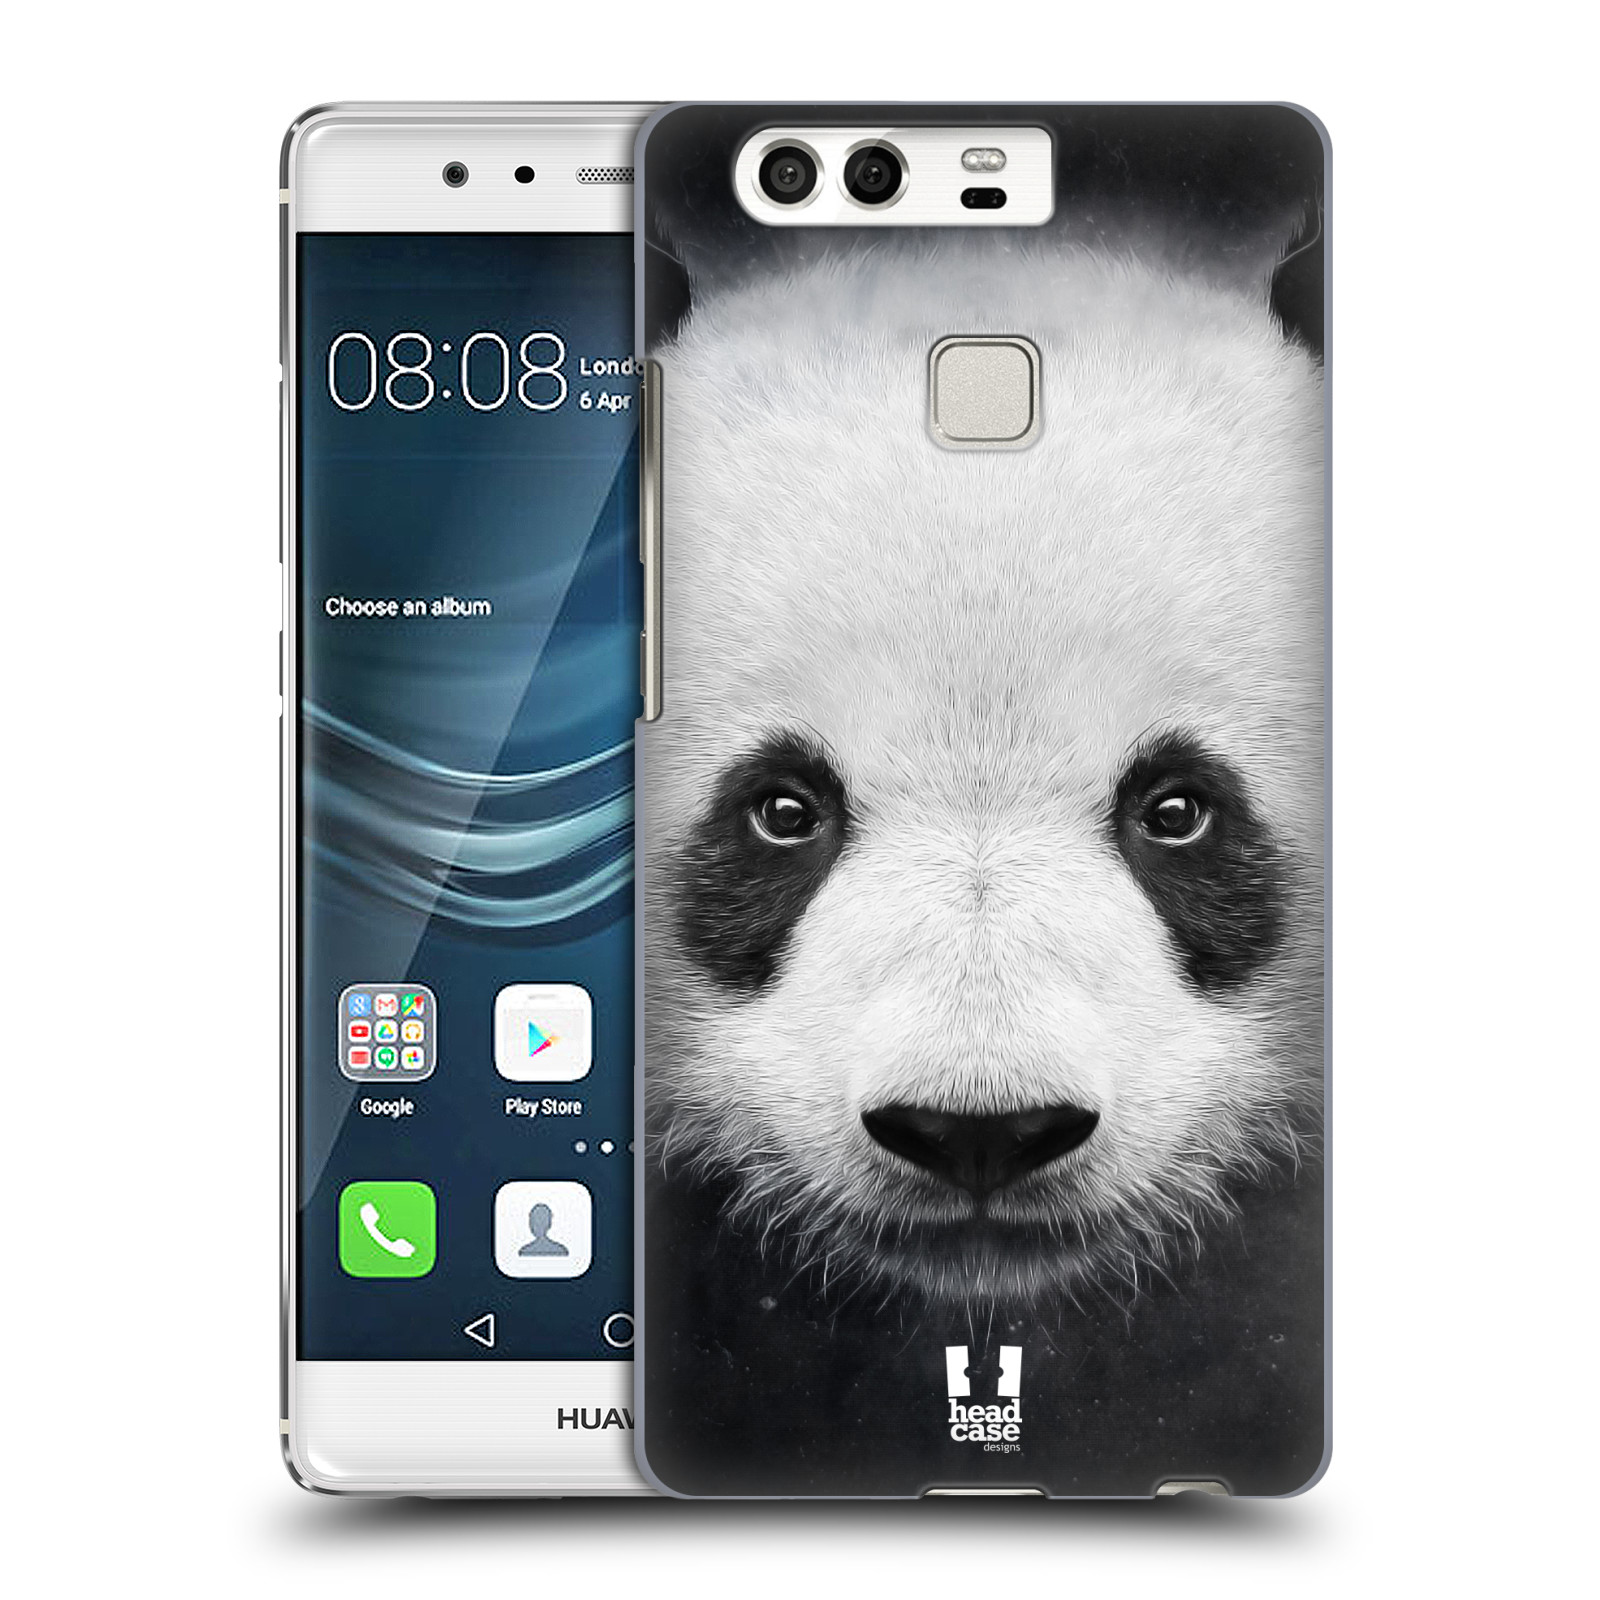 HEAD CASE plastový obal na mobil Huawei P9 / P9 DUAL SIM vzor Zvířecí tváře medvěd panda